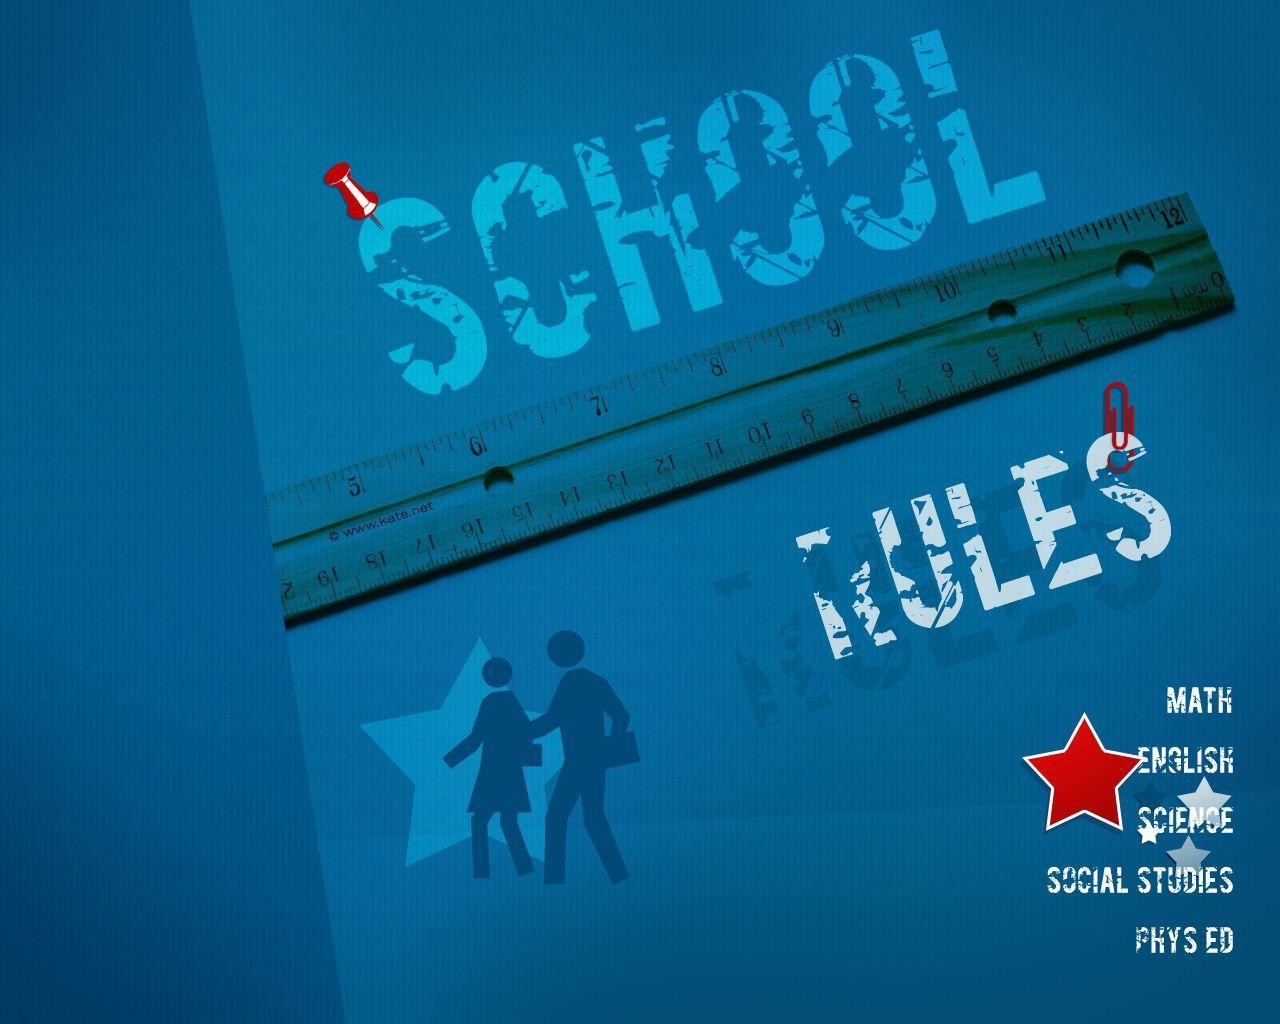 Blue School Wallpapers Top Free Blue School Backgrounds Wallpaperaccess